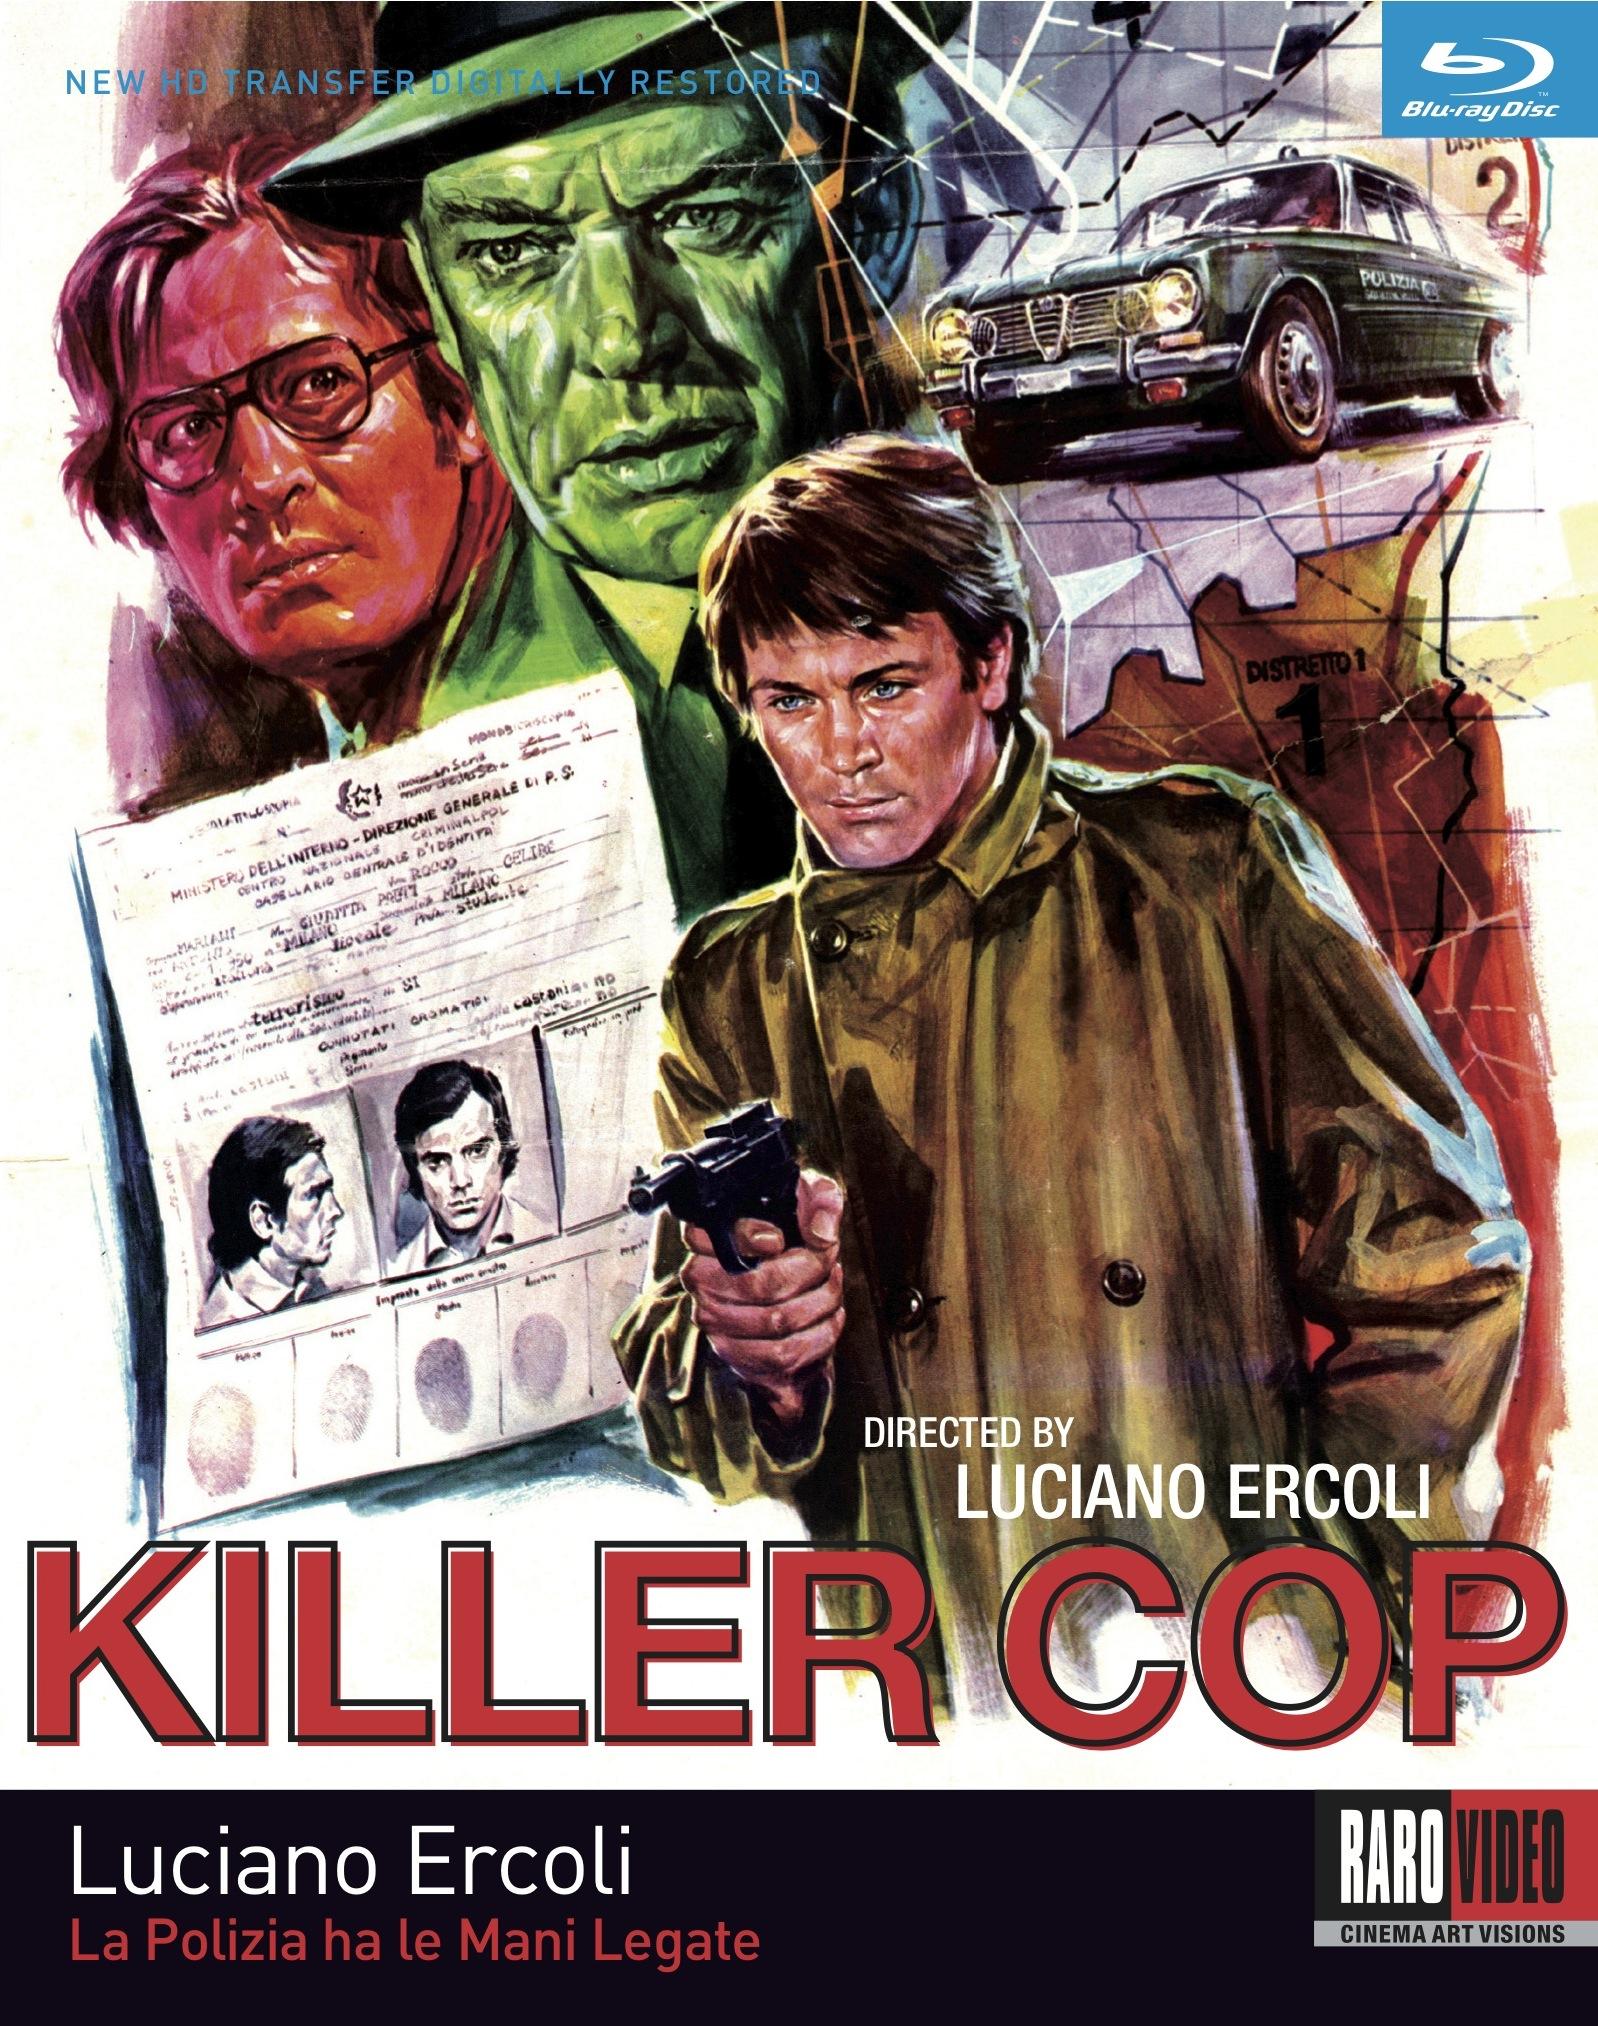 Killer Cop [blu-ray] [1976] 27712349